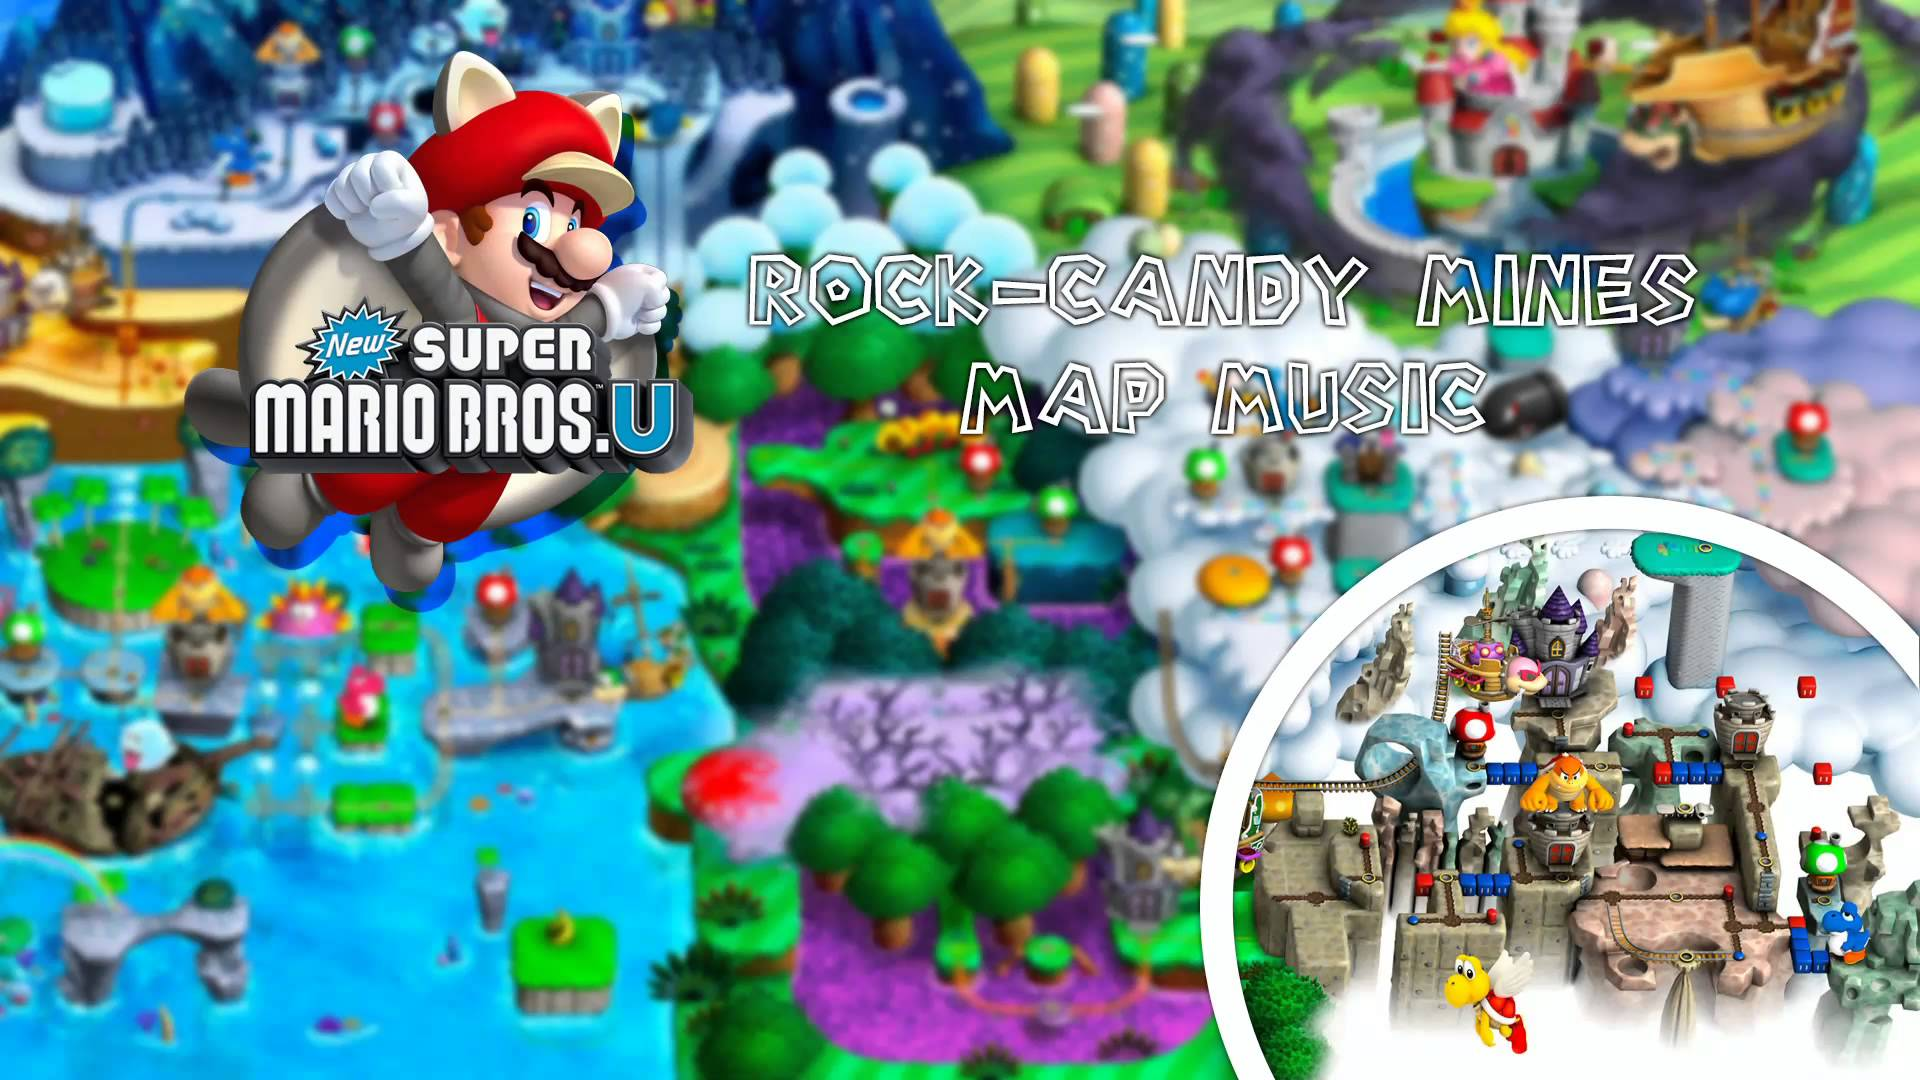 Super Mario World Map Wallpapers - Wallpaper Cave